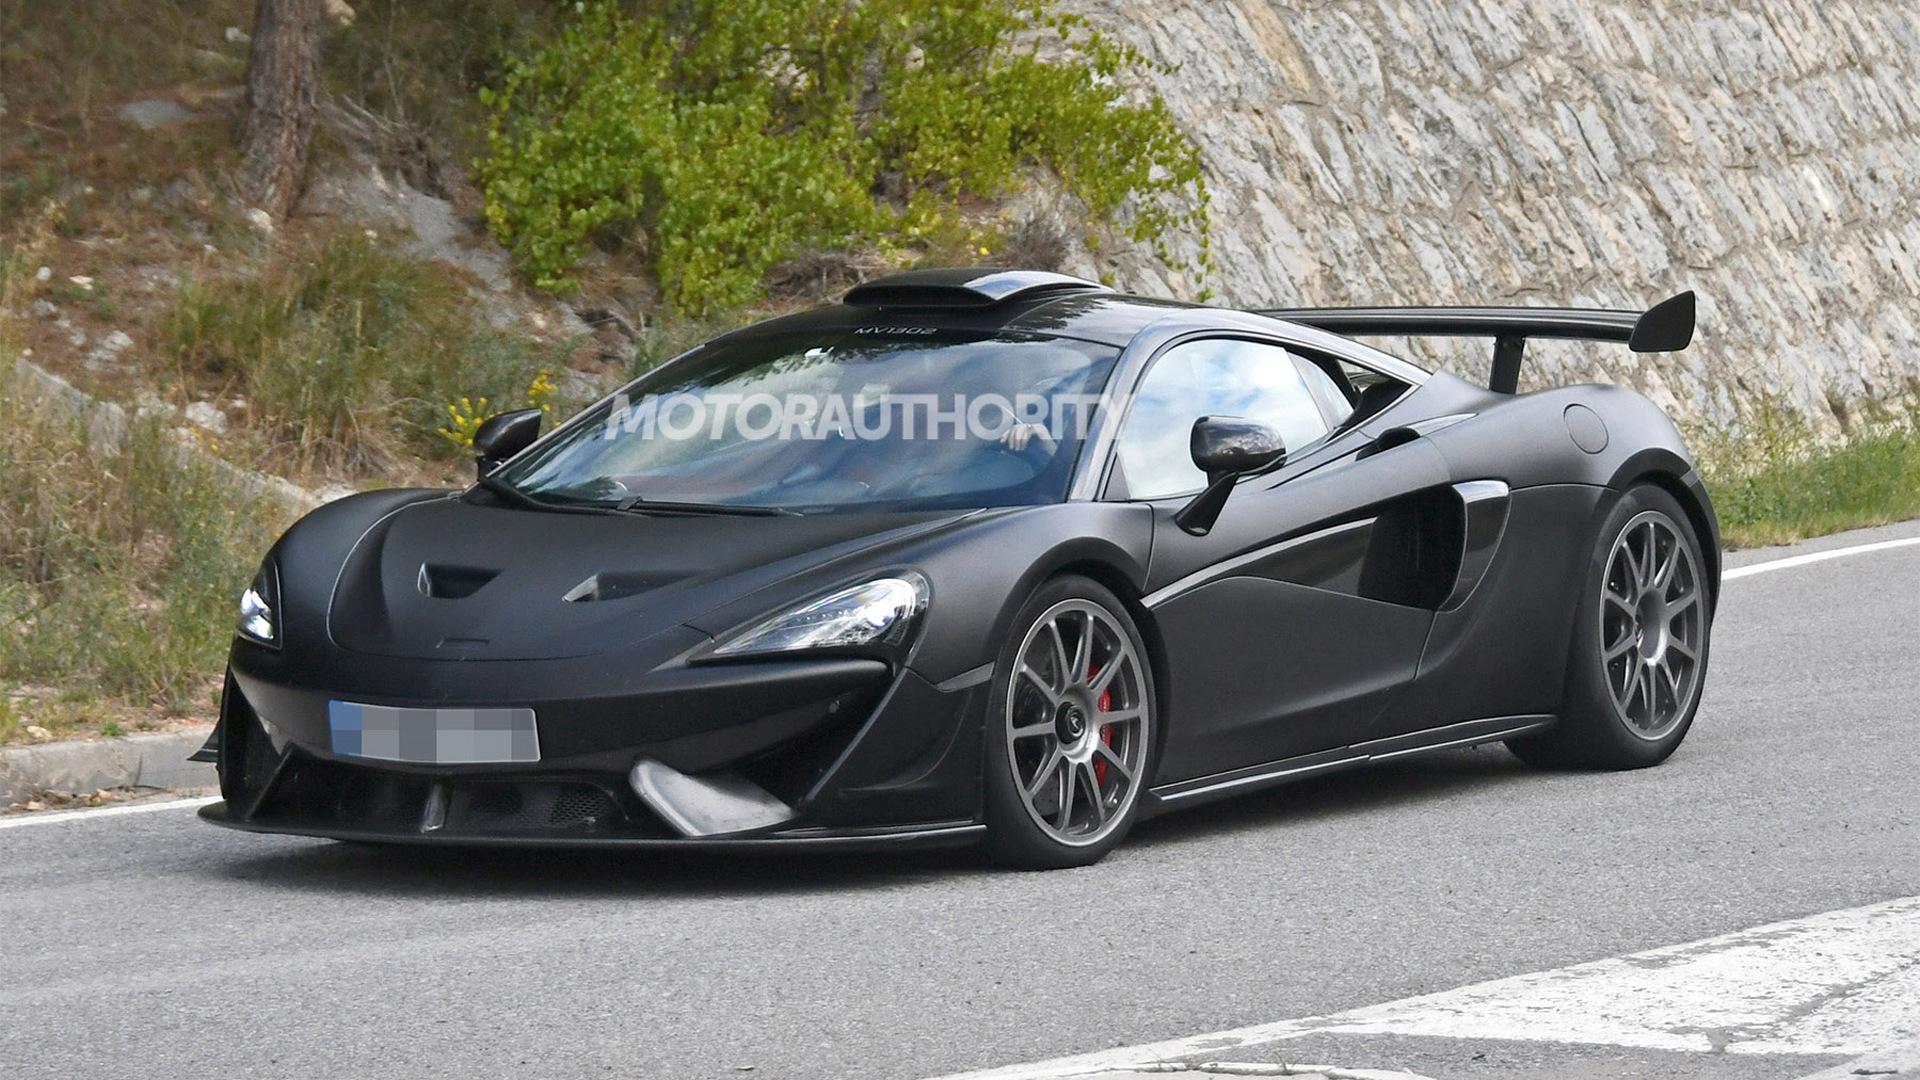 2021 McLaren 620R spy shots - Photo credit: S. Baldauf/SB-Medien